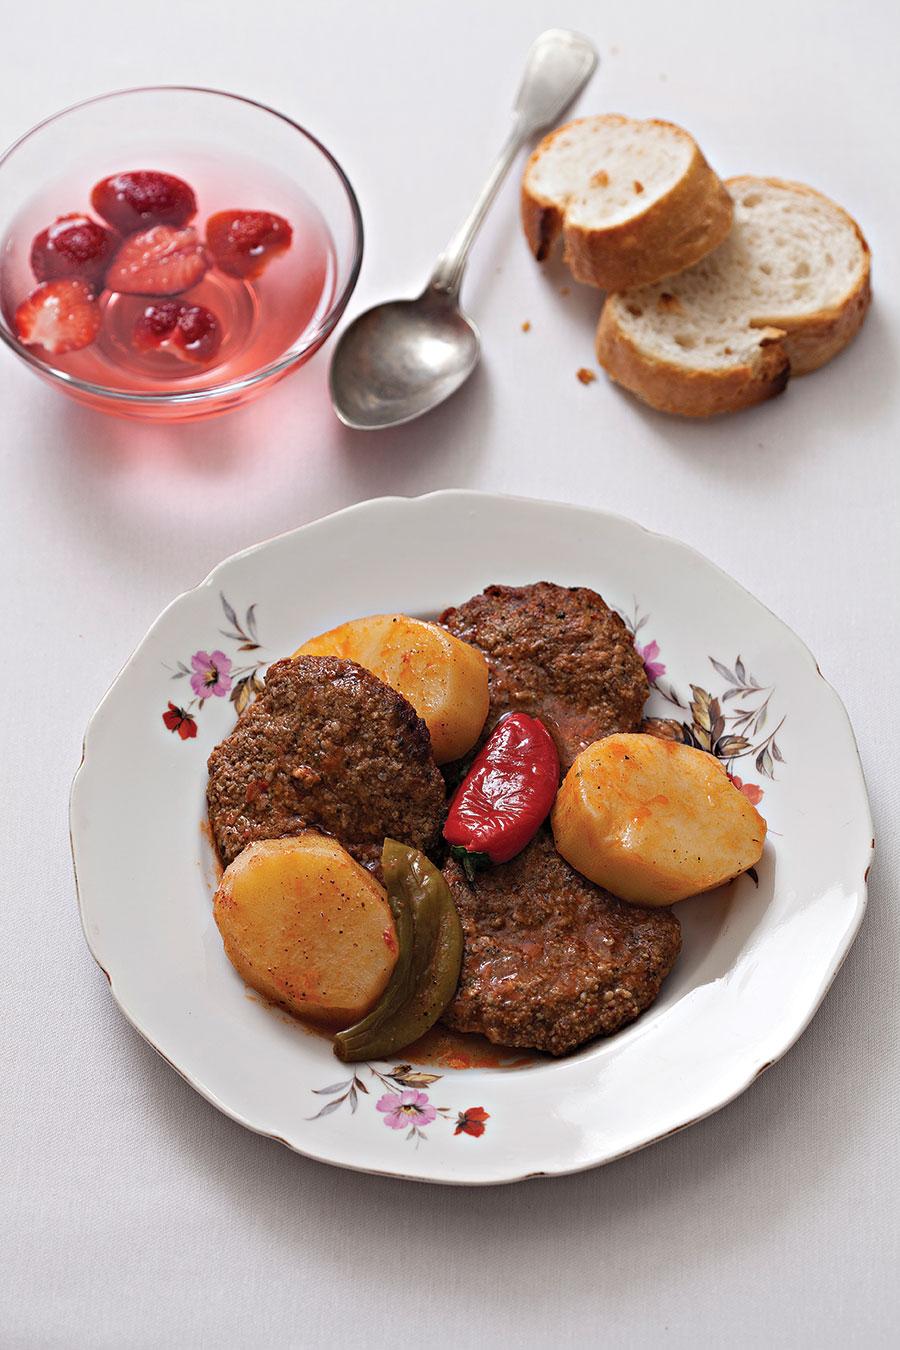 tencerede_patatesli_kofte_yemek_zevki